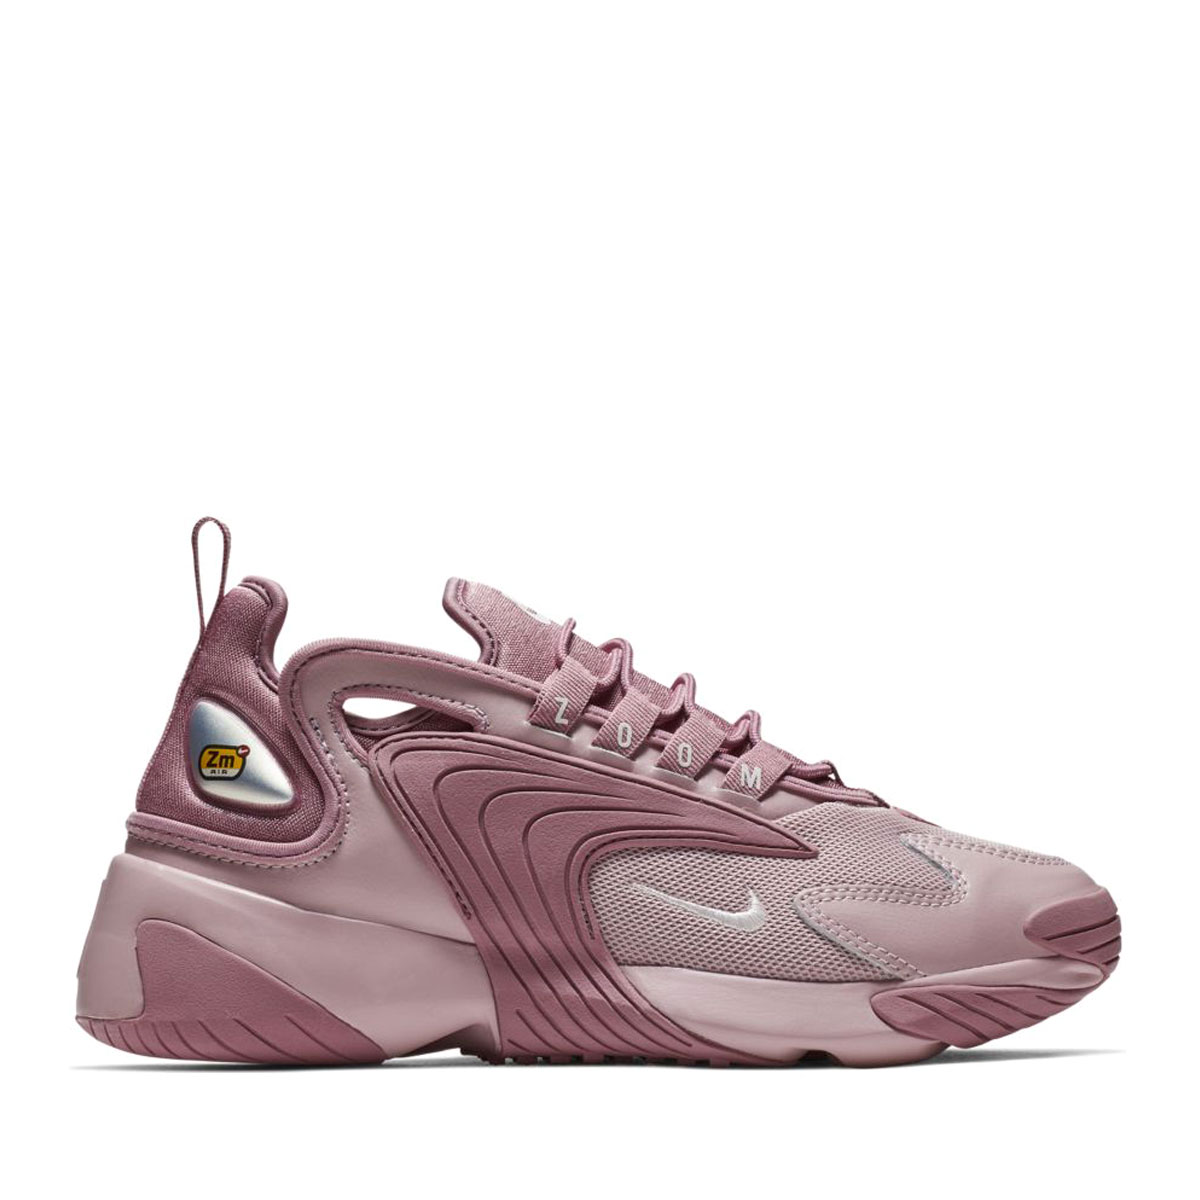 73cb82f85b81f NIKE WMNS ZOOM 2K (PLUM DUST PALE PINK-PLUM CHALK) (Nike women zoom 2K)